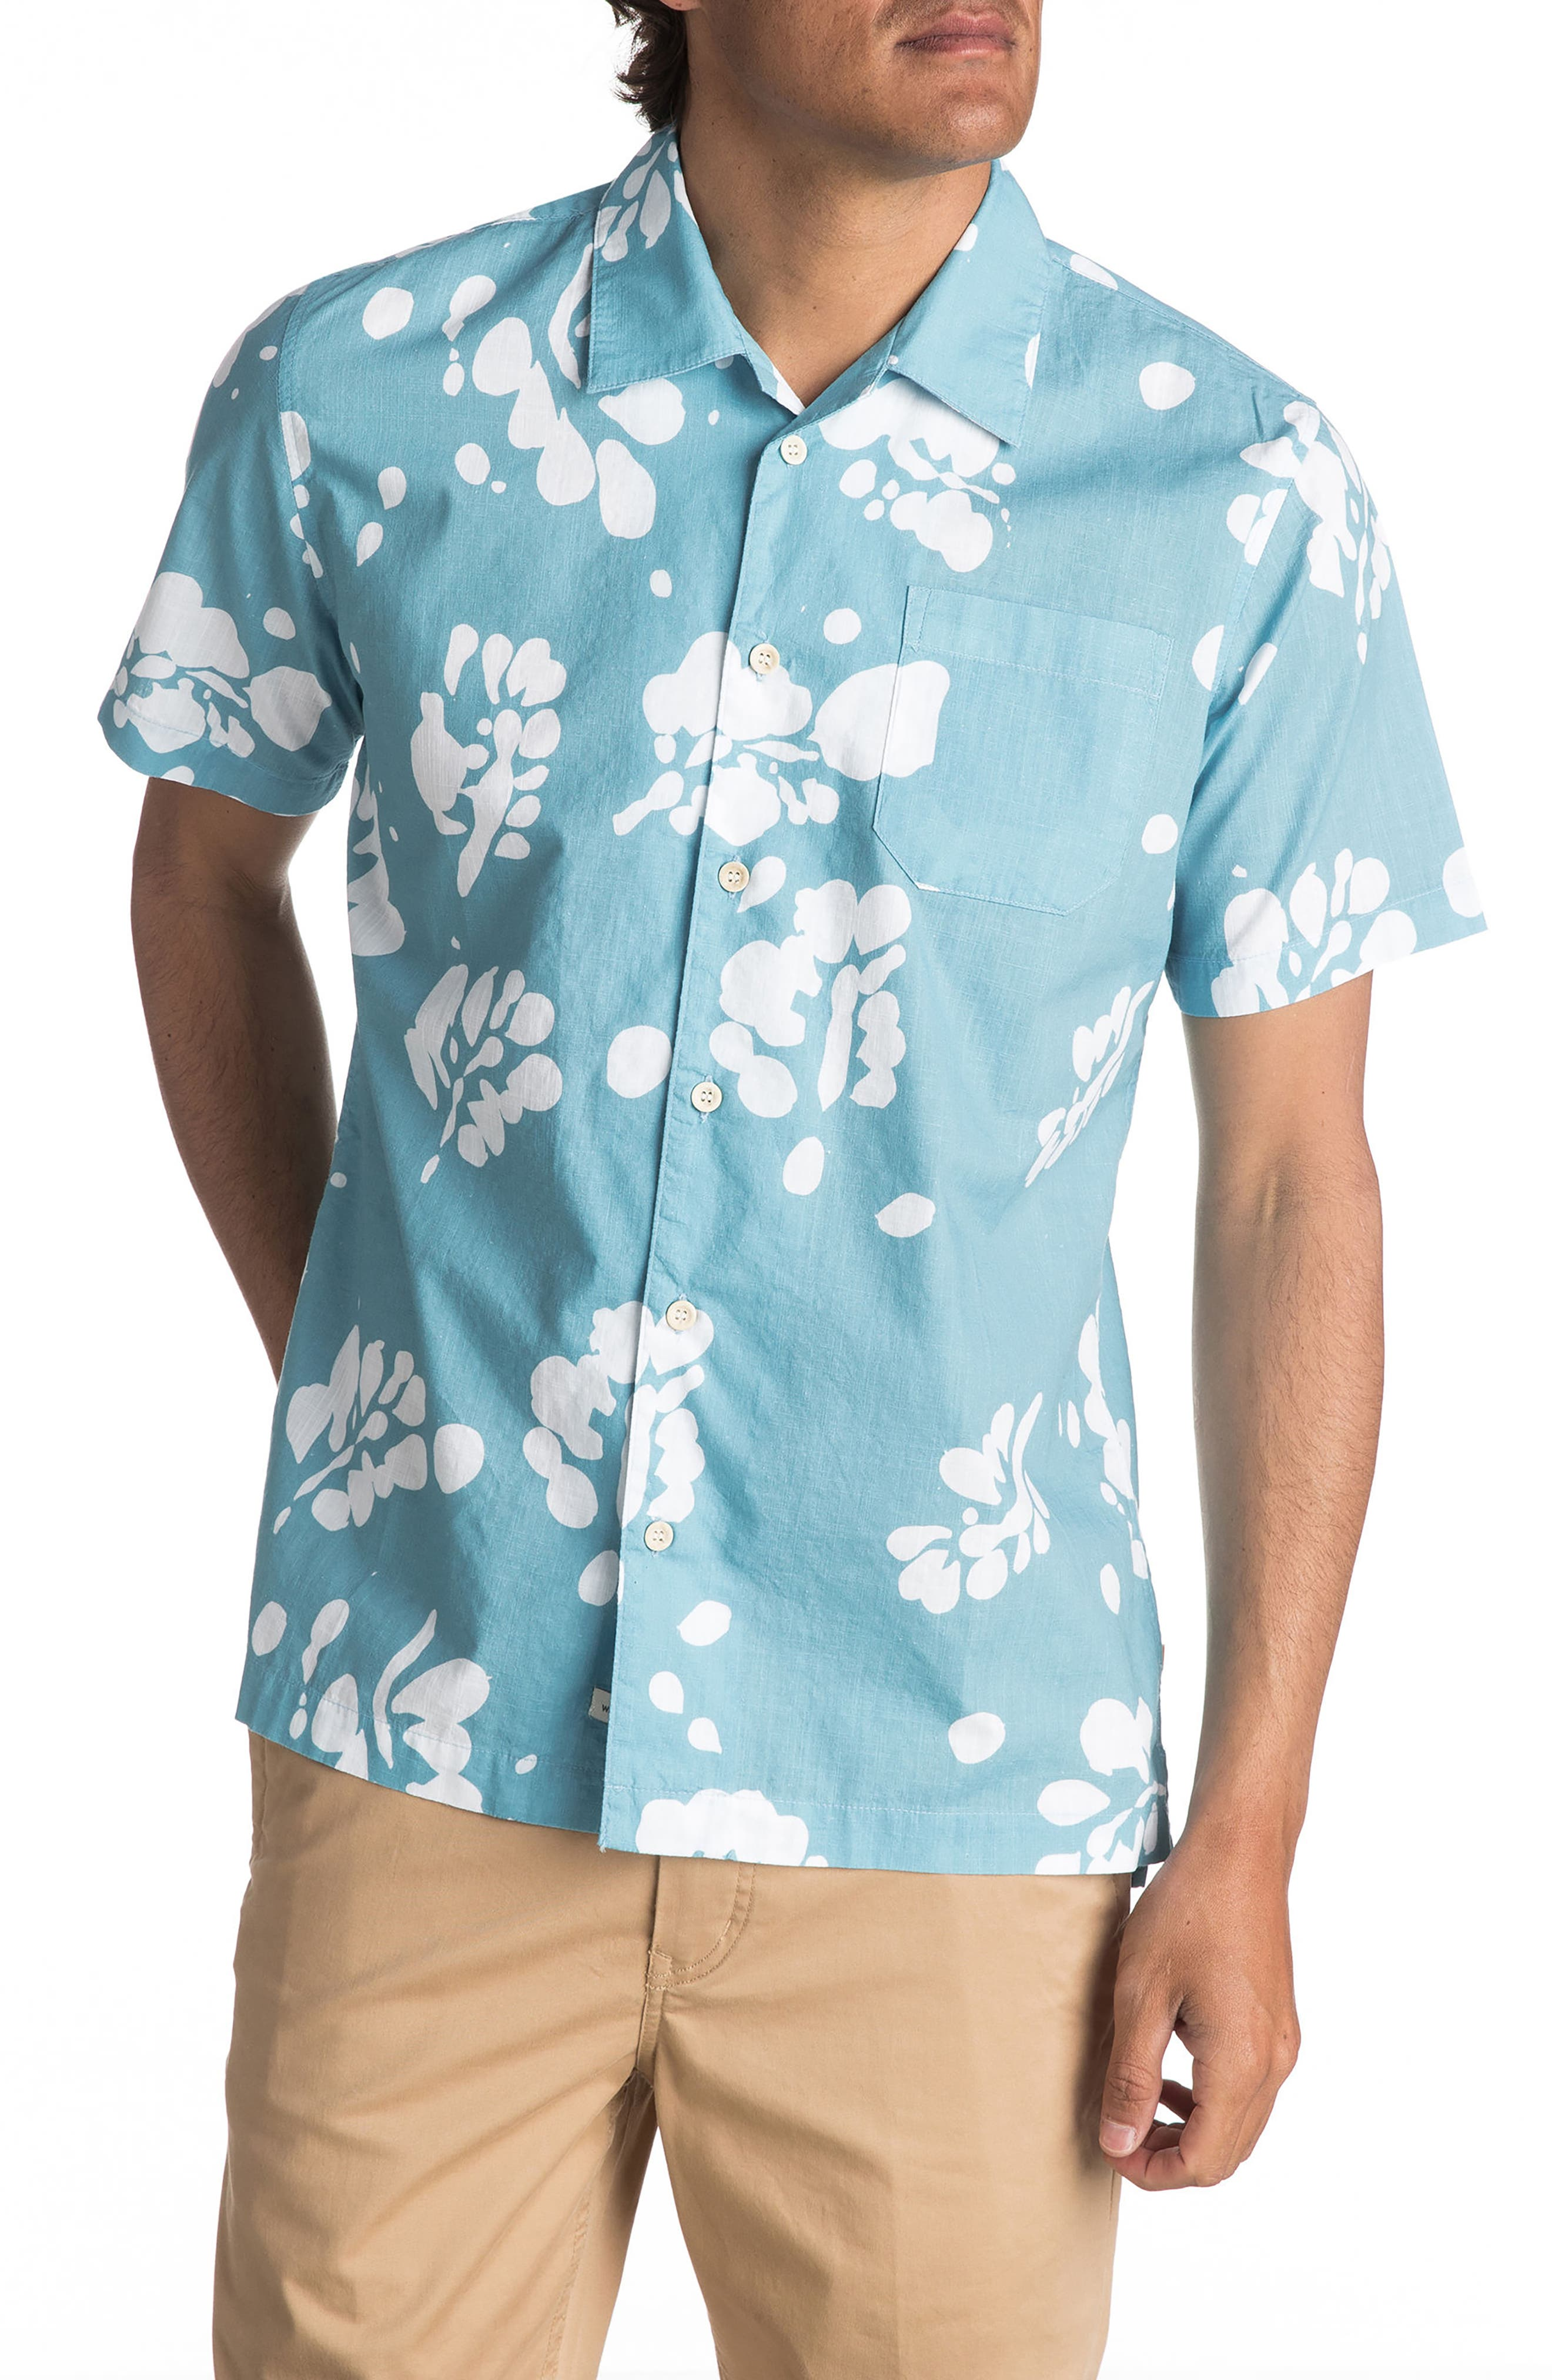 Alternate Image 1 Selected - Quiksilver Waterman Collection Los Palmas Woven Shirt